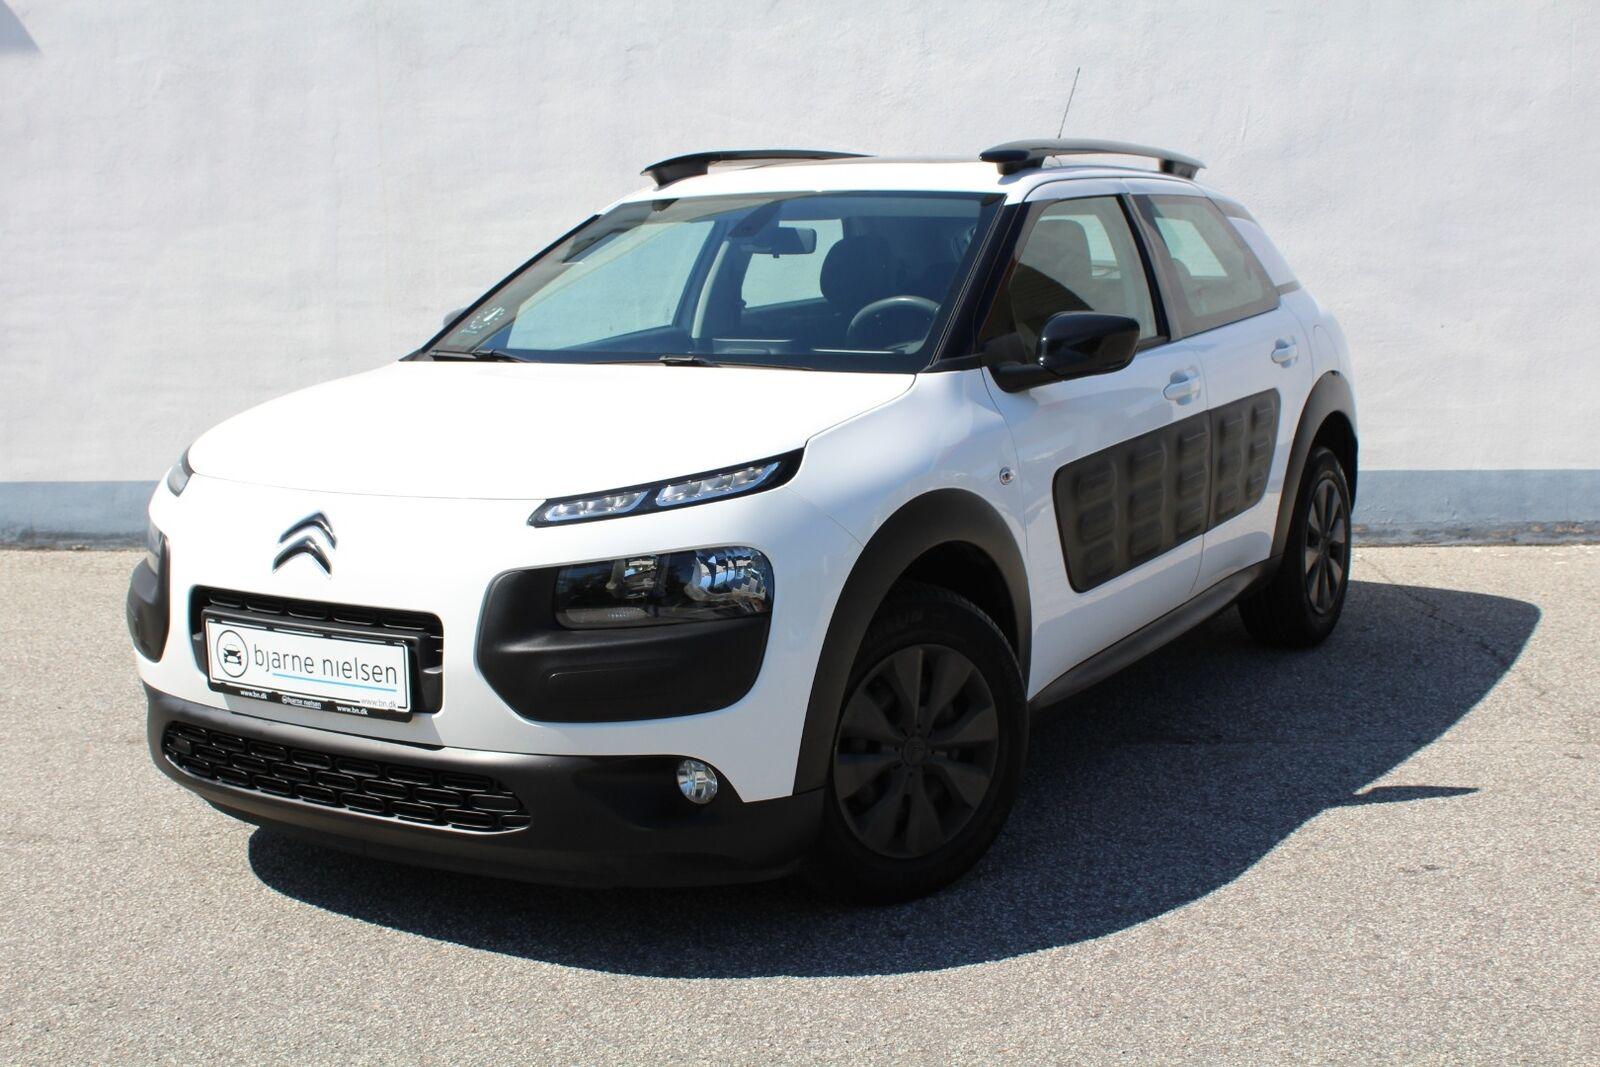 Citroën C4 Cactus 1,6 BlueHDi 100 Extravaganza